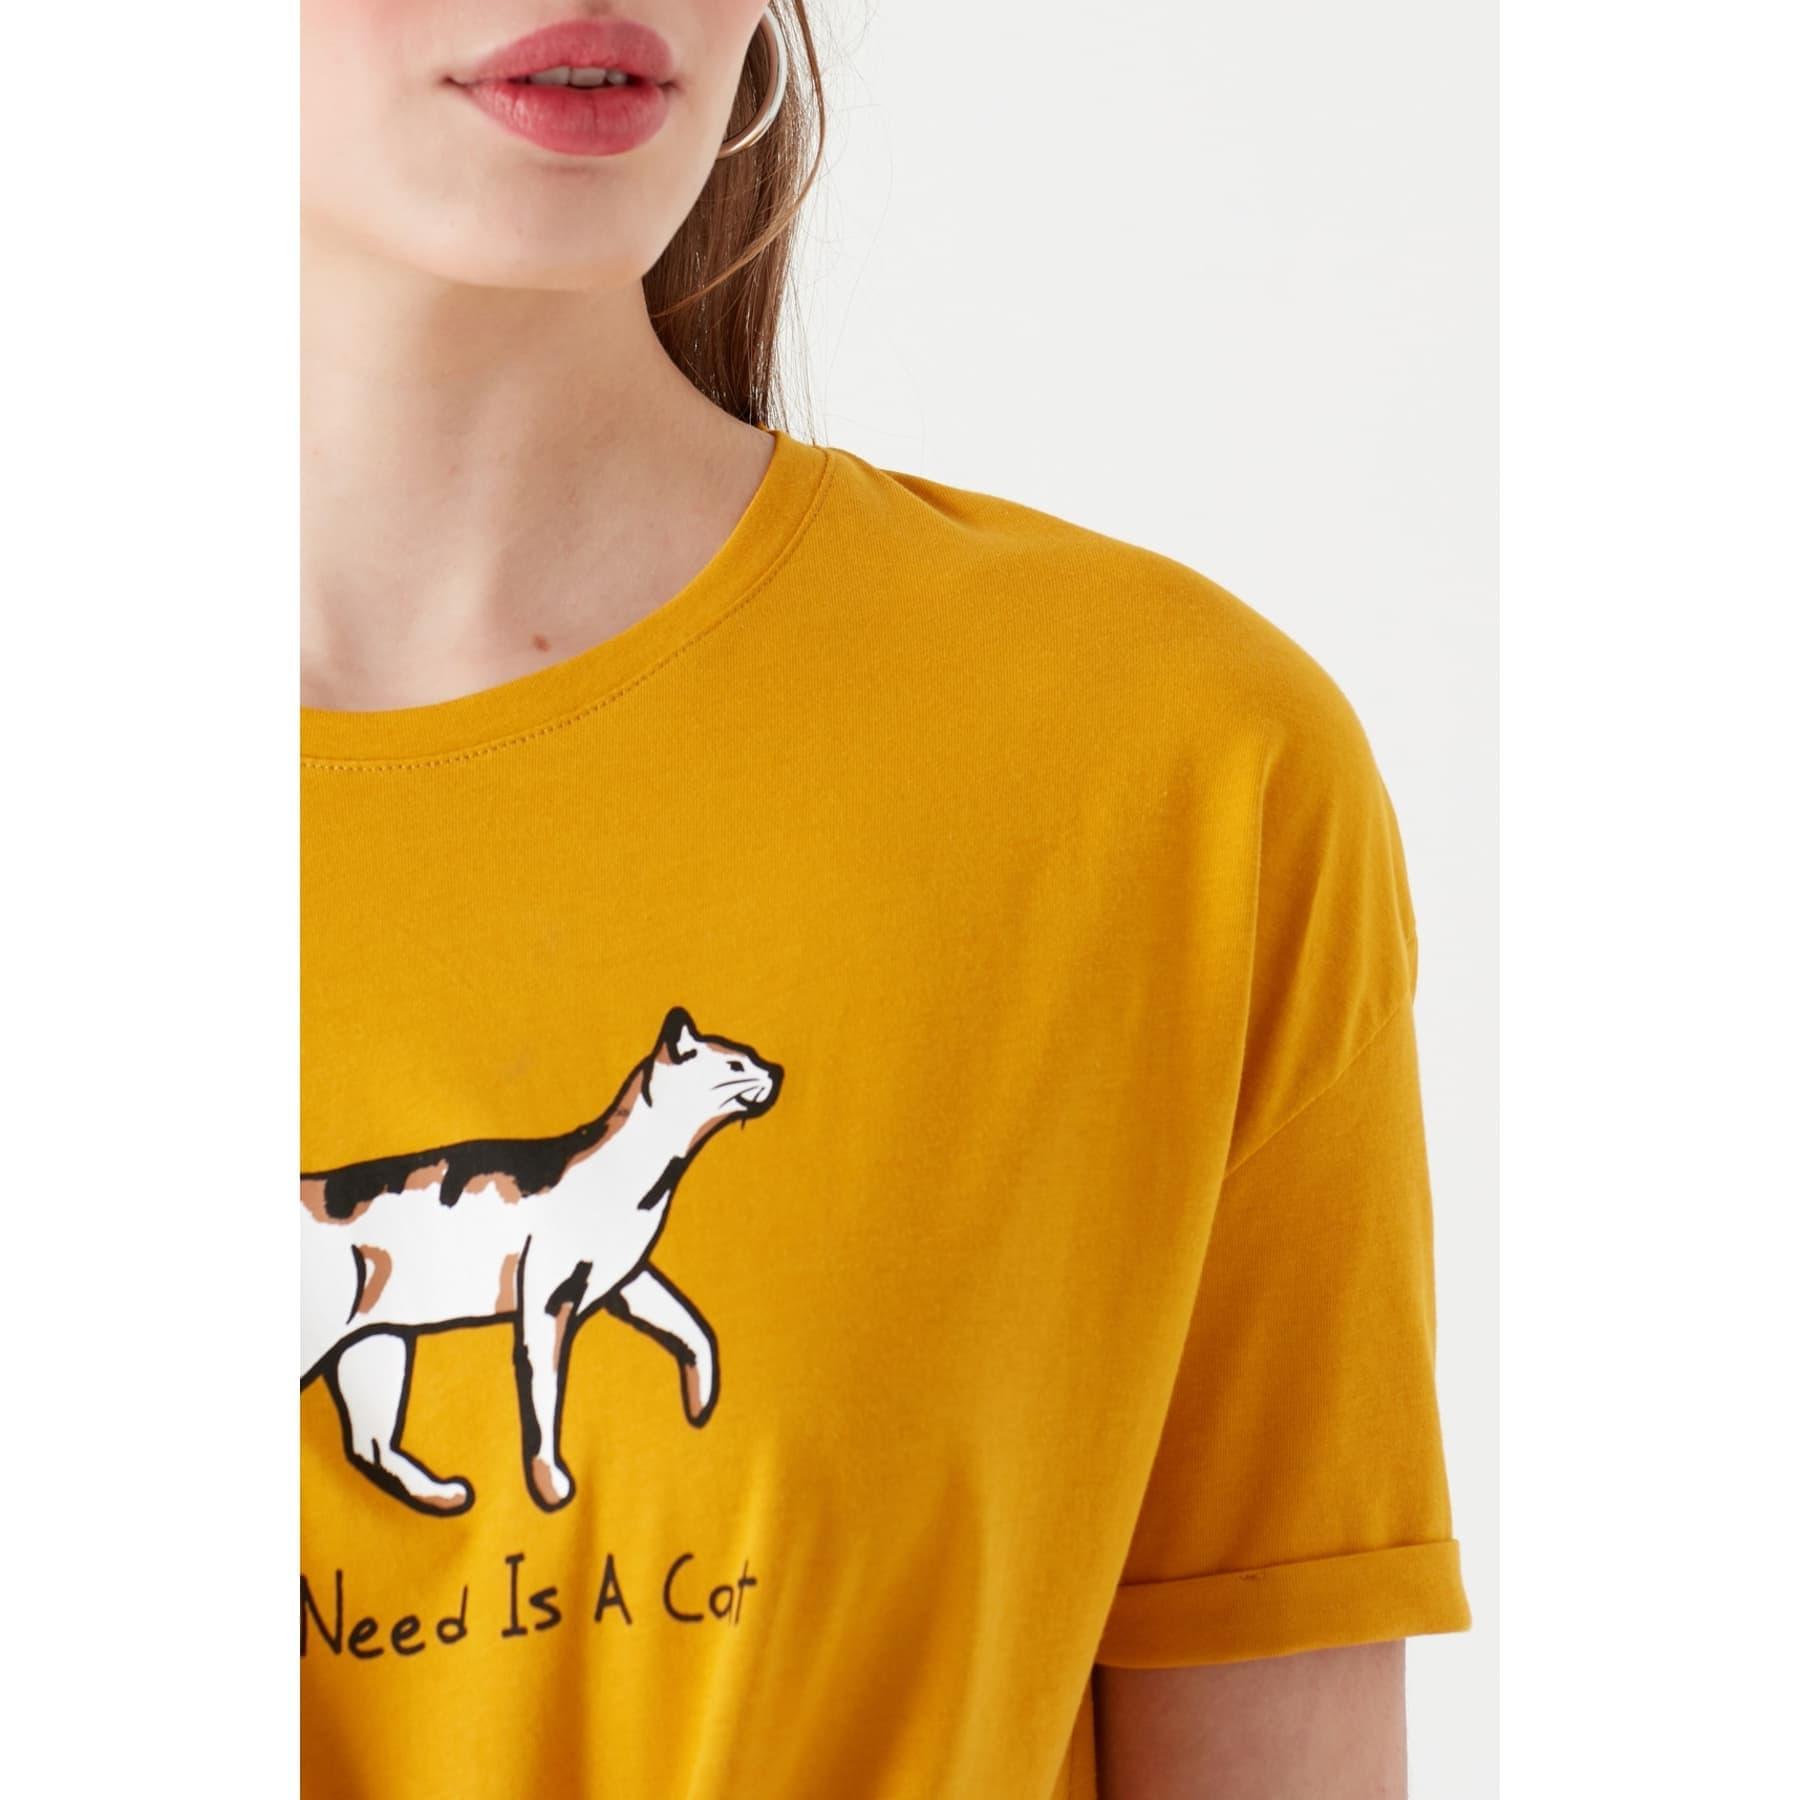 Kedi Baskili Penye Koyu Sarı